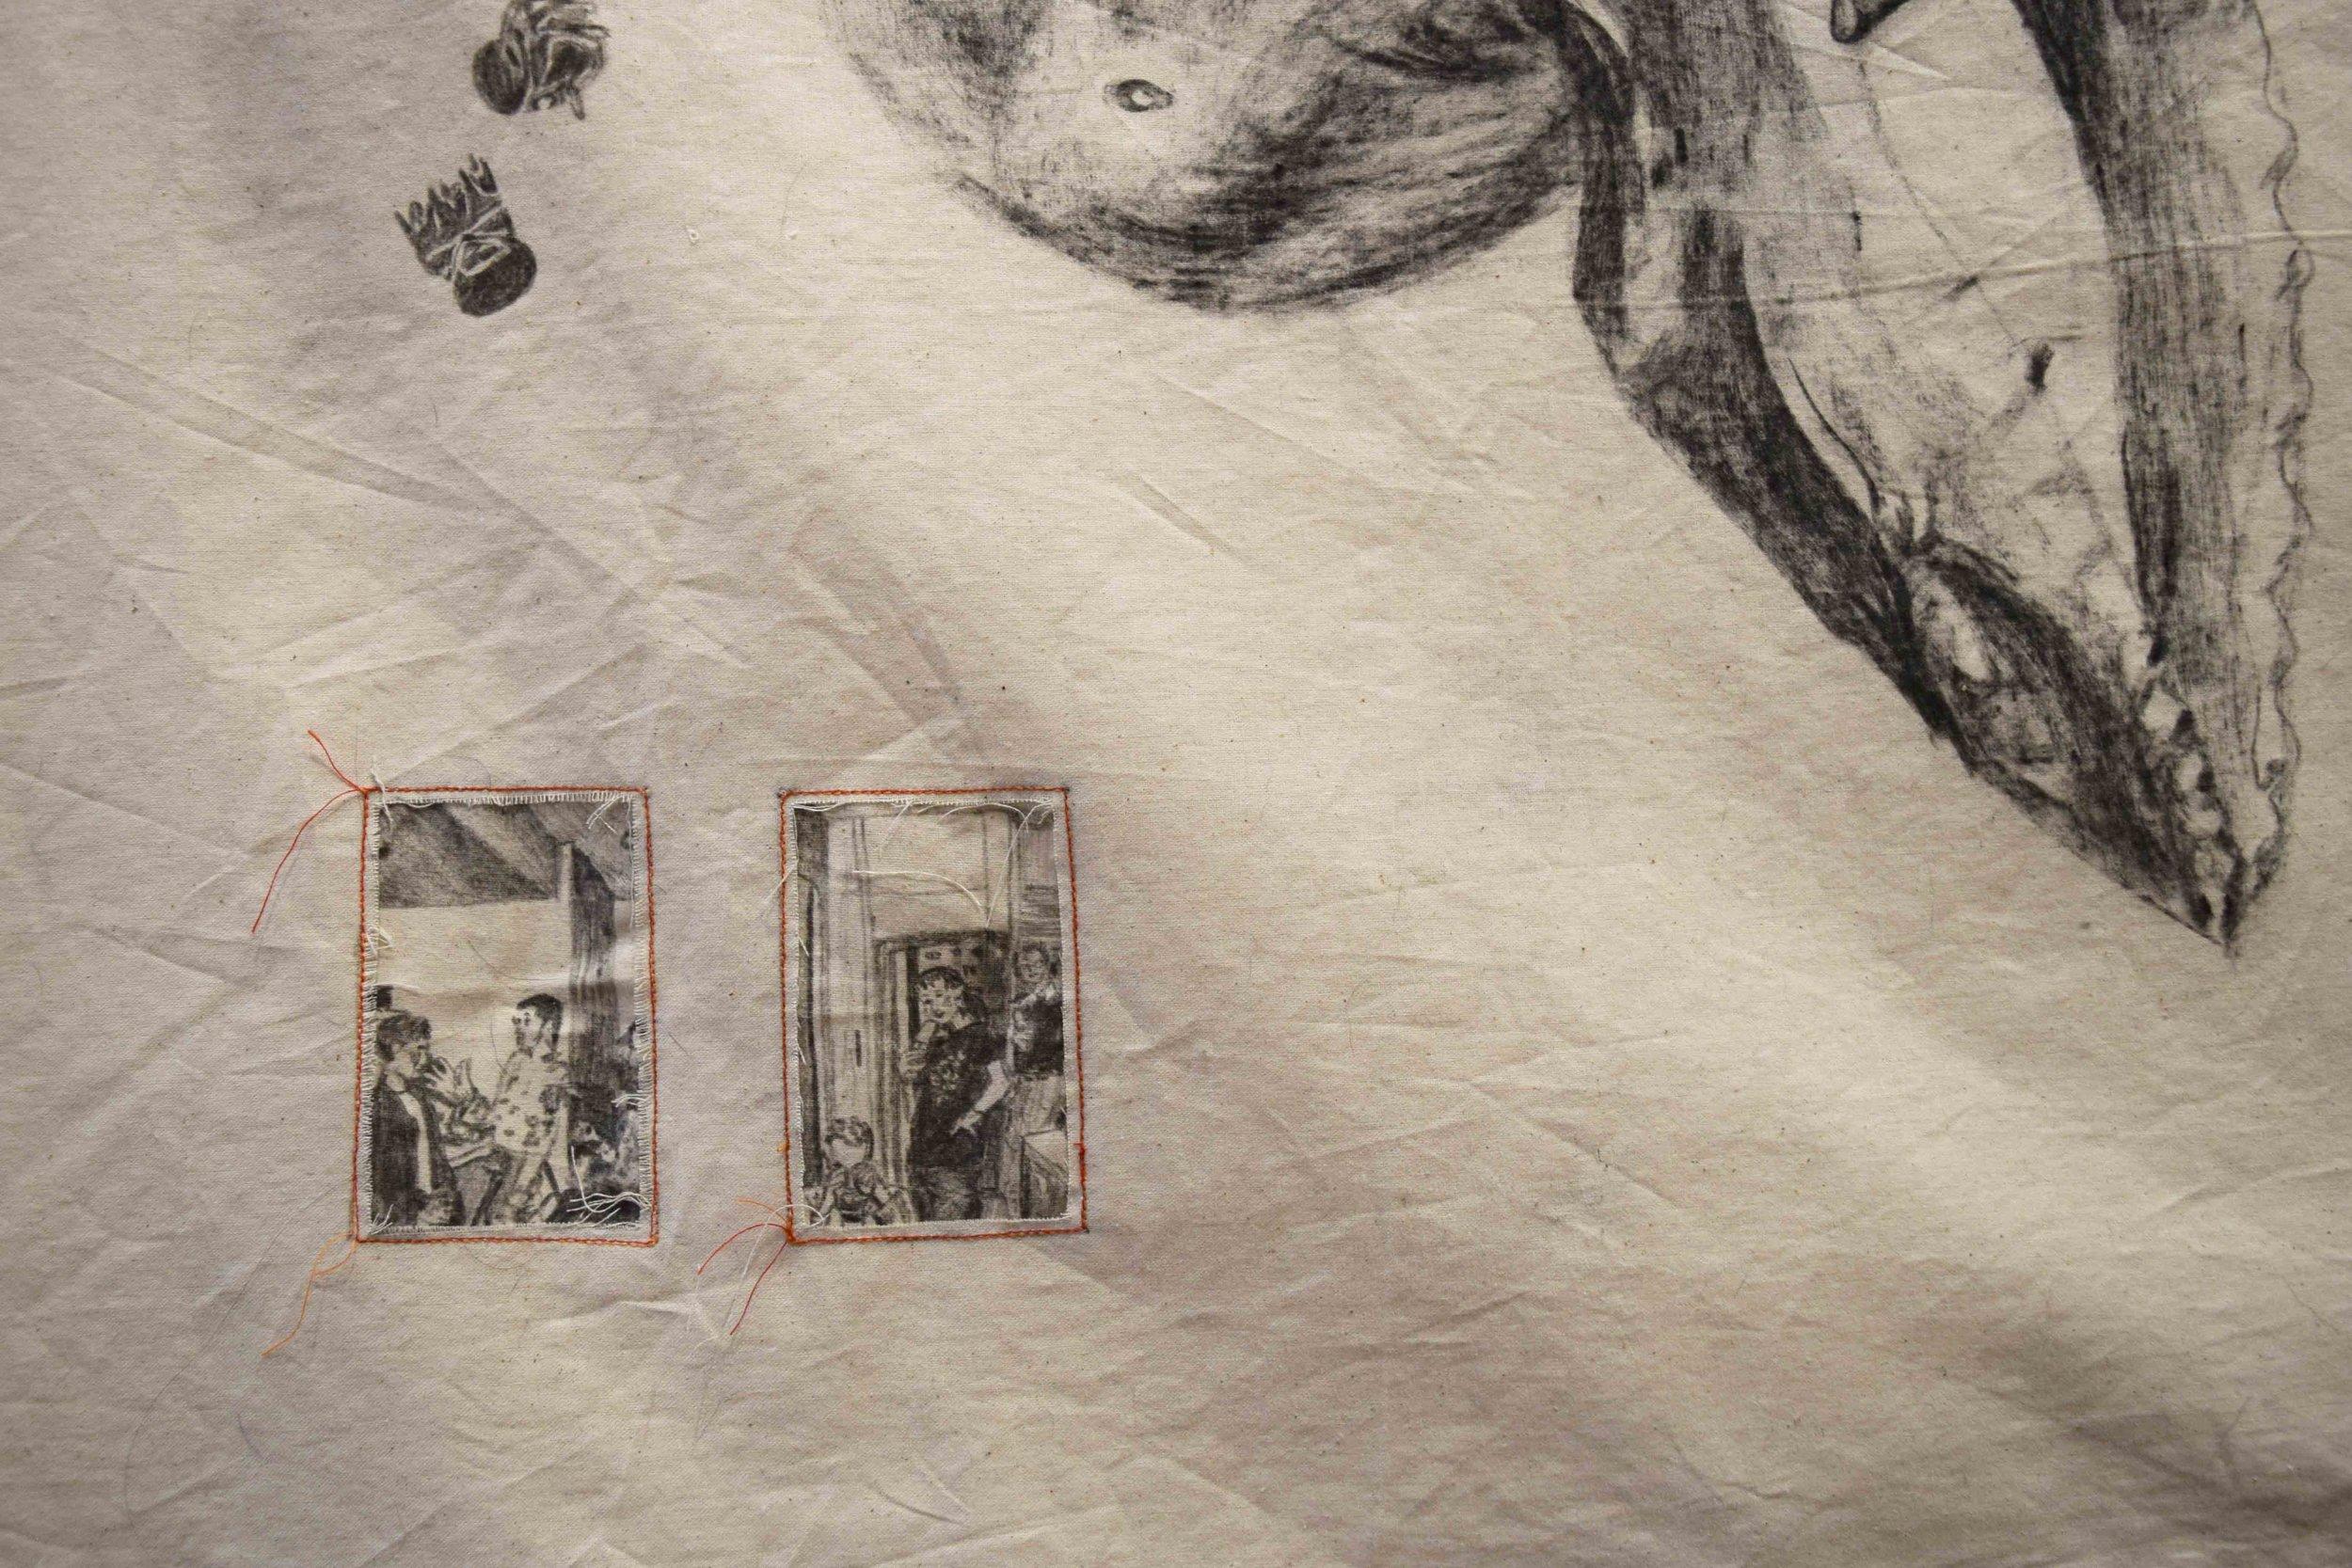 73. Zoe Sydney,  Image Storage Mechanisim (large)  (detail), mixed media drawing on cotton, 490 x 95 cm $500  WINNER - OVERALL WINNER - TRADITIONAL MEDIA